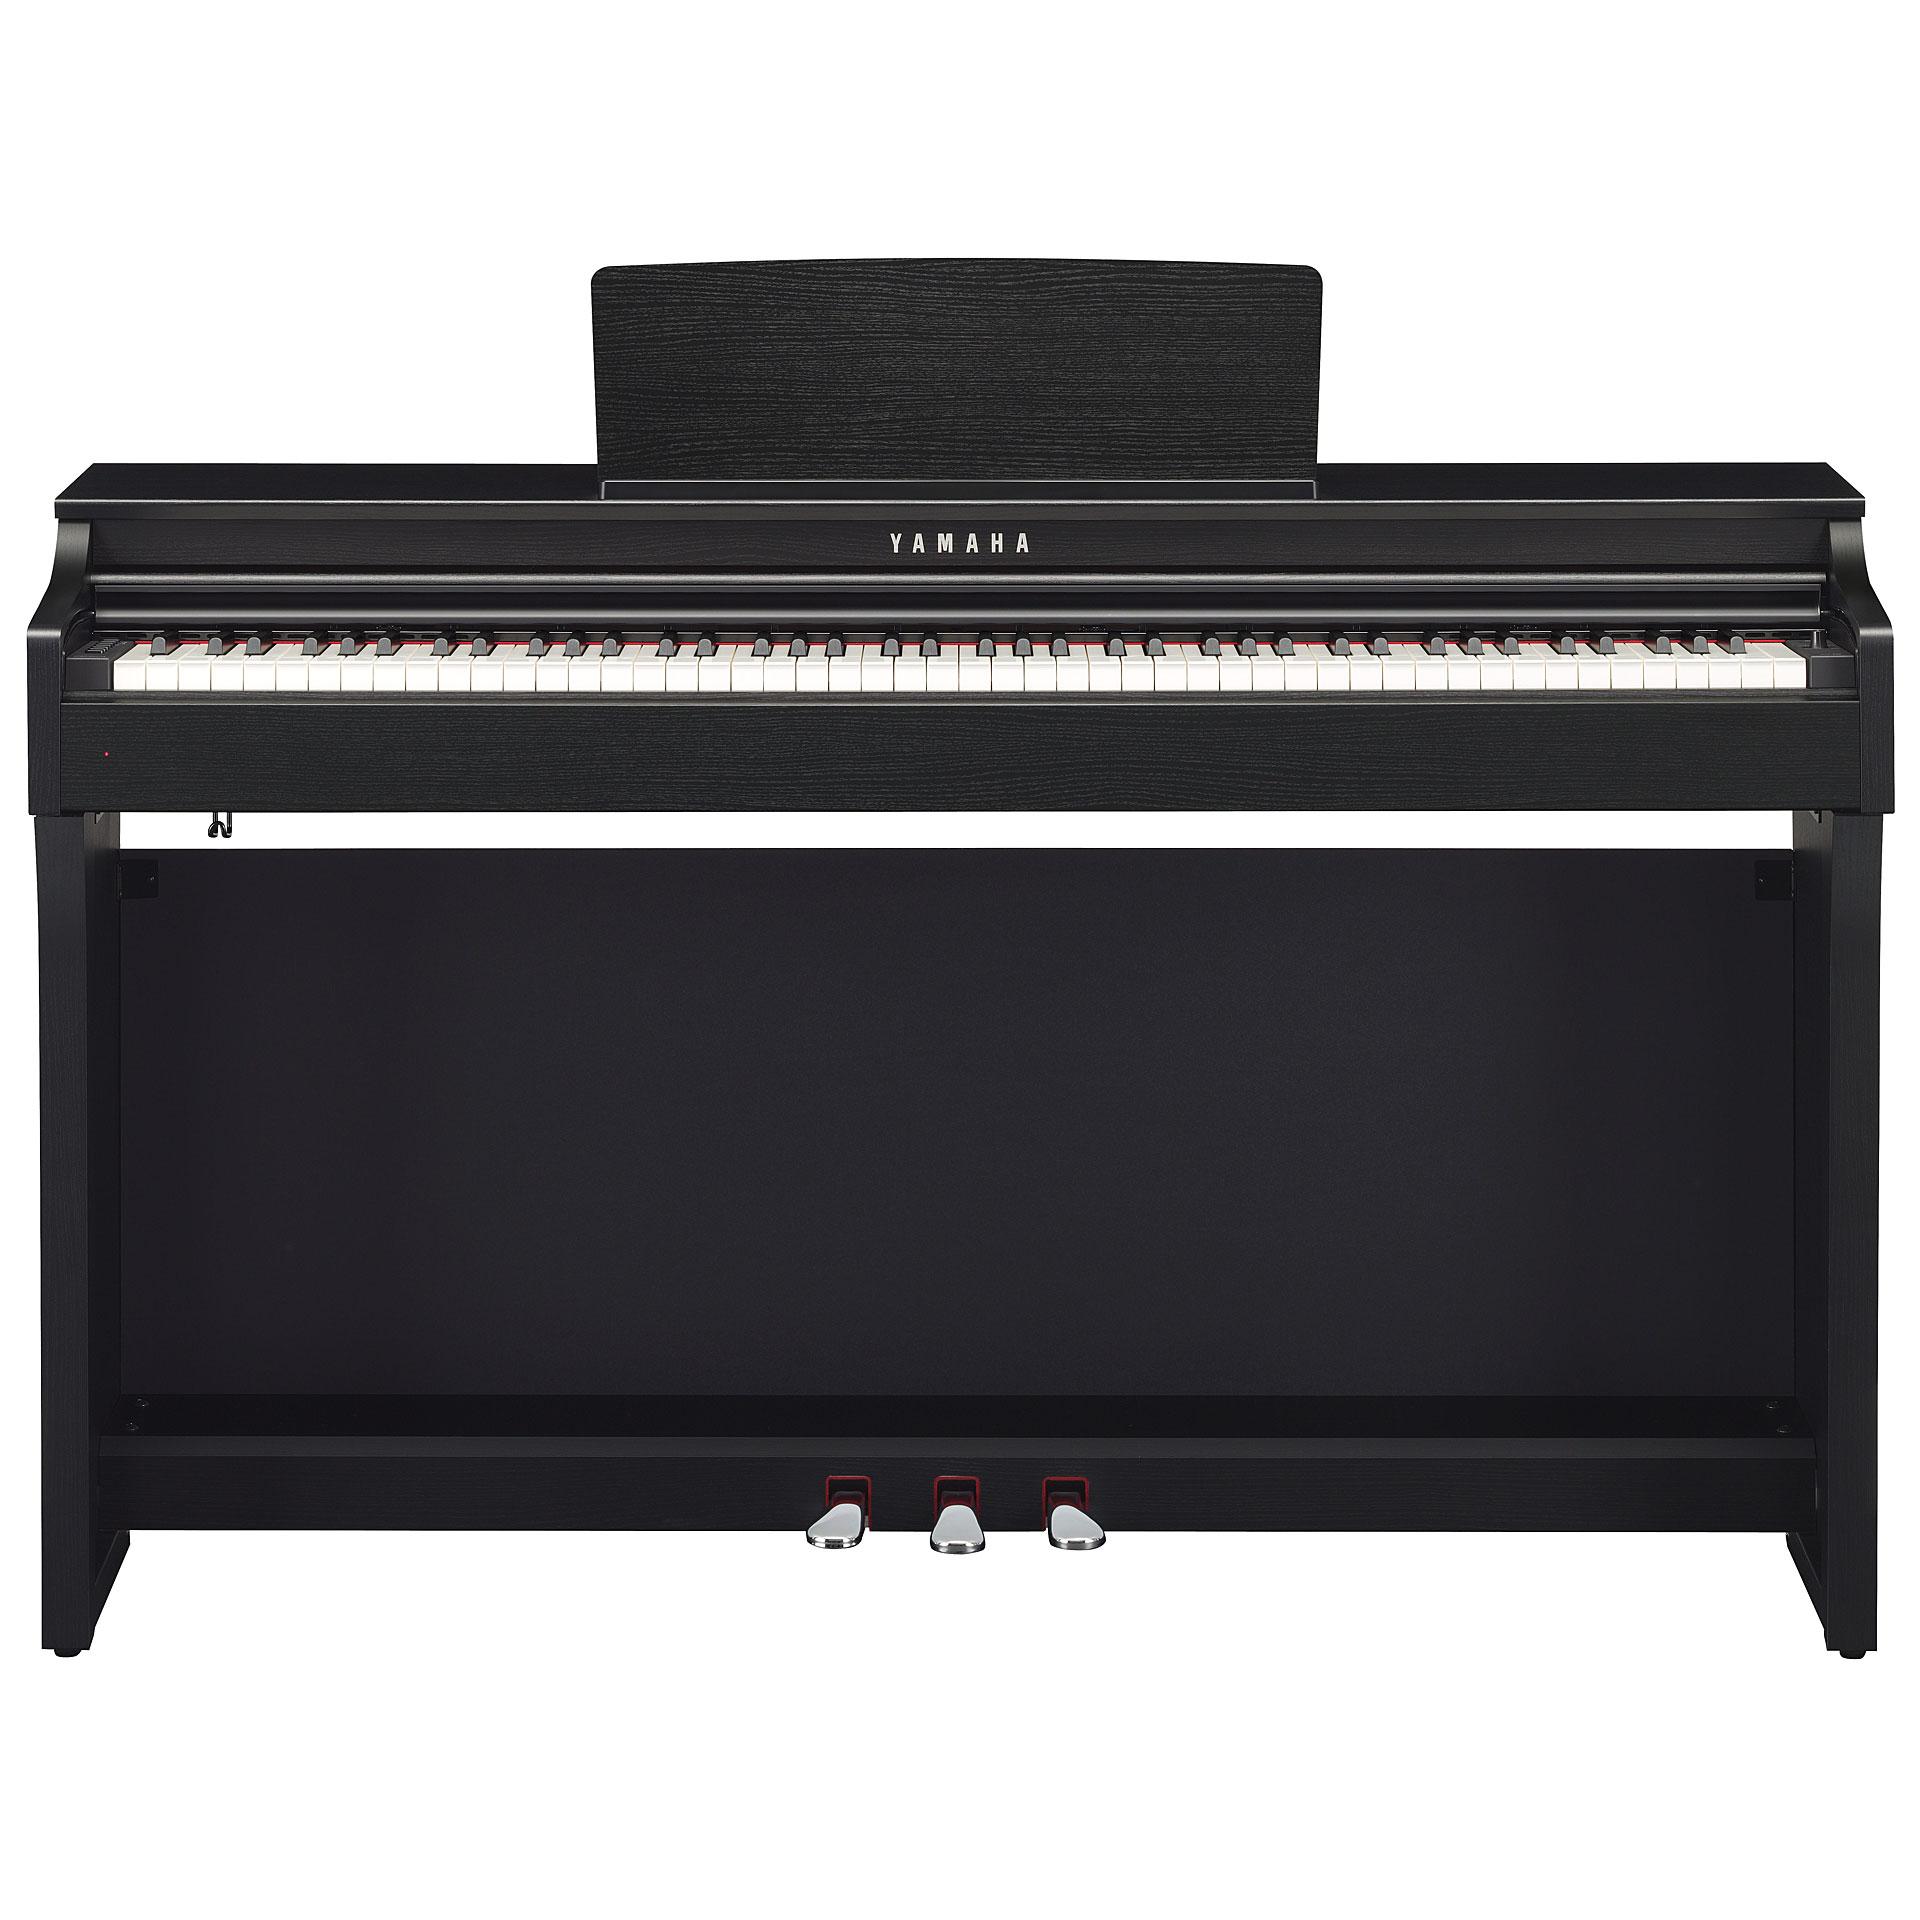 yamaha clavinova clp 625b digital piano. Black Bedroom Furniture Sets. Home Design Ideas